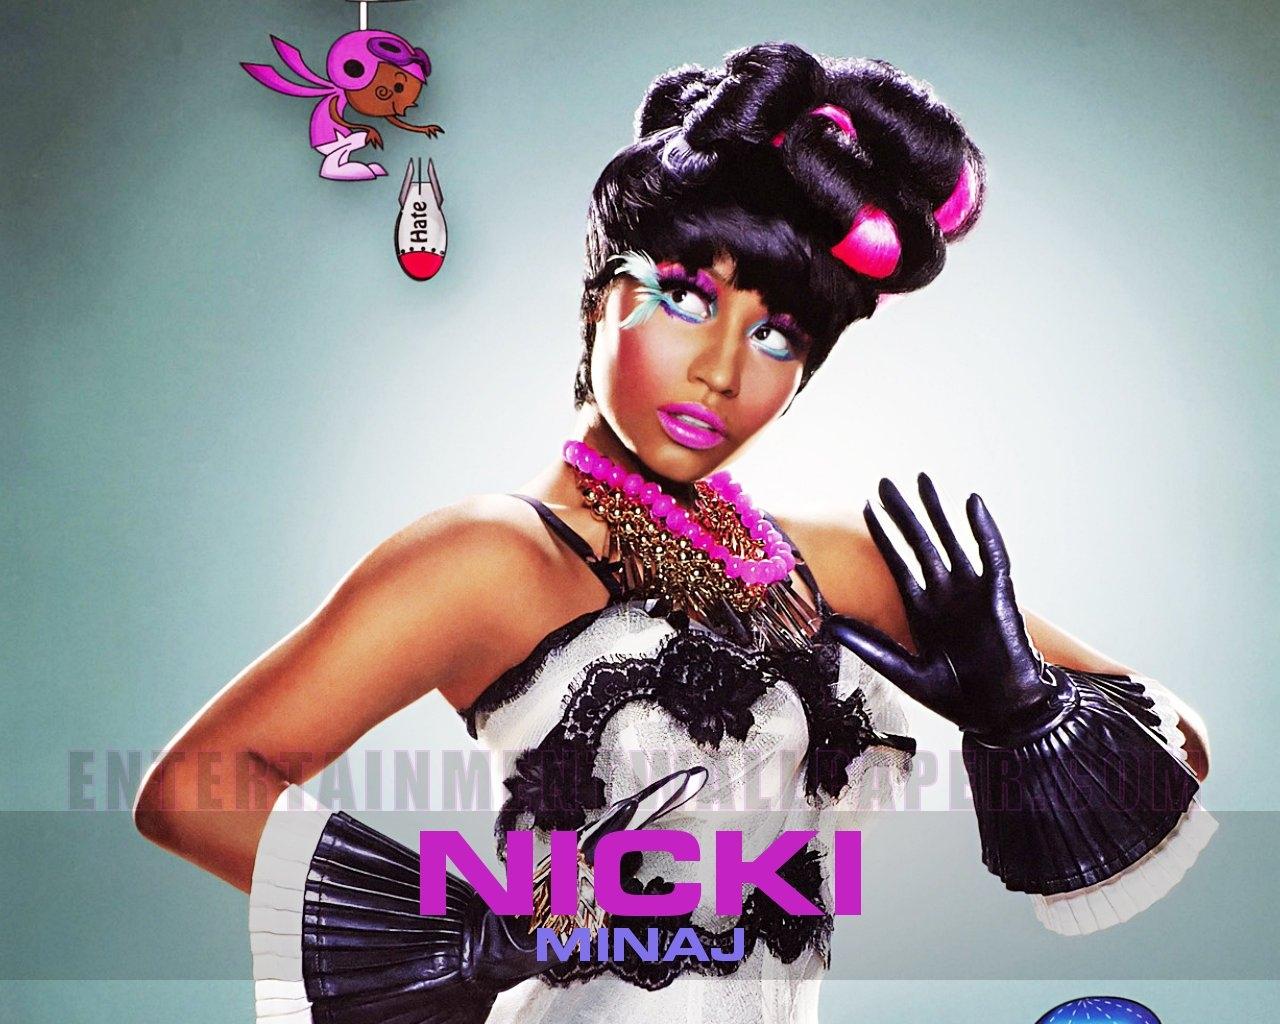 http://4.bp.blogspot.com/-1VfXDZ_I3SE/T8N2HOvR3pI/AAAAAAAAAO4/JmXupGMx_FE/s1600/Nicki+Minaj+wallpapers+9.jpg